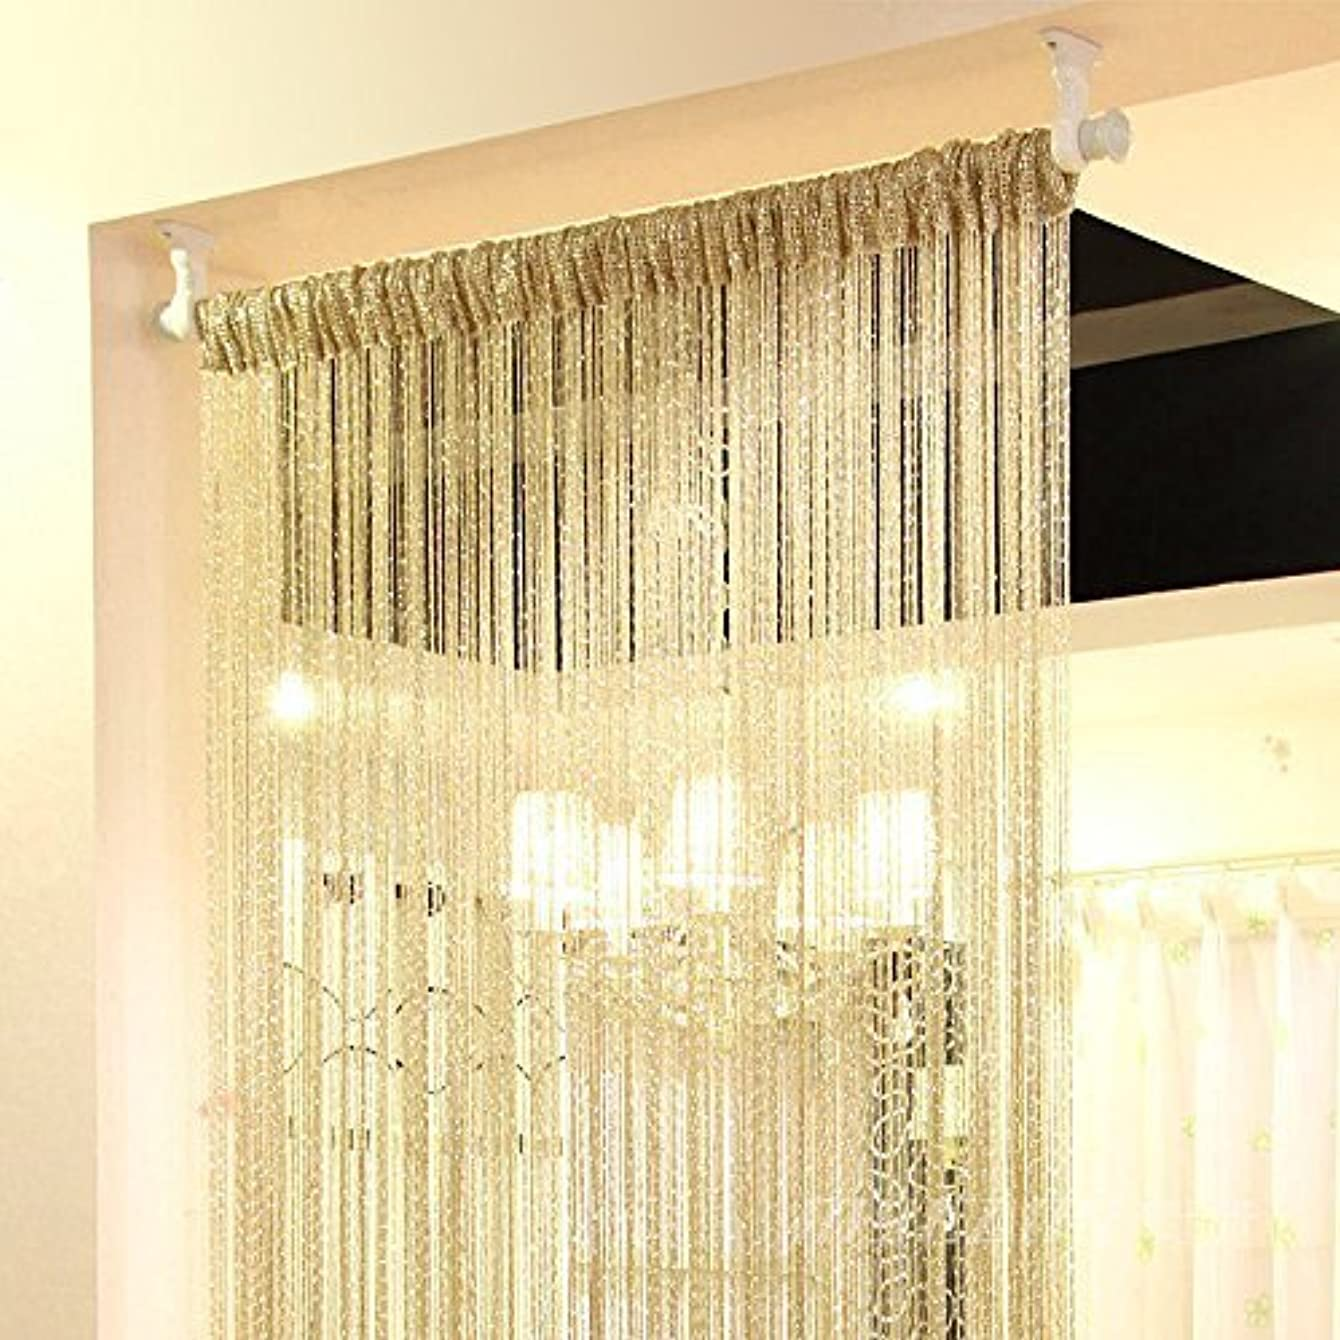 Hdecor 39X78 inch Door String Curtain Rare Flat Silver Ribbon Thread Fringe Window Panel Room Divider Cute Strip Tassel for Wedding Coffee House Restaurant Parts (Champagne)